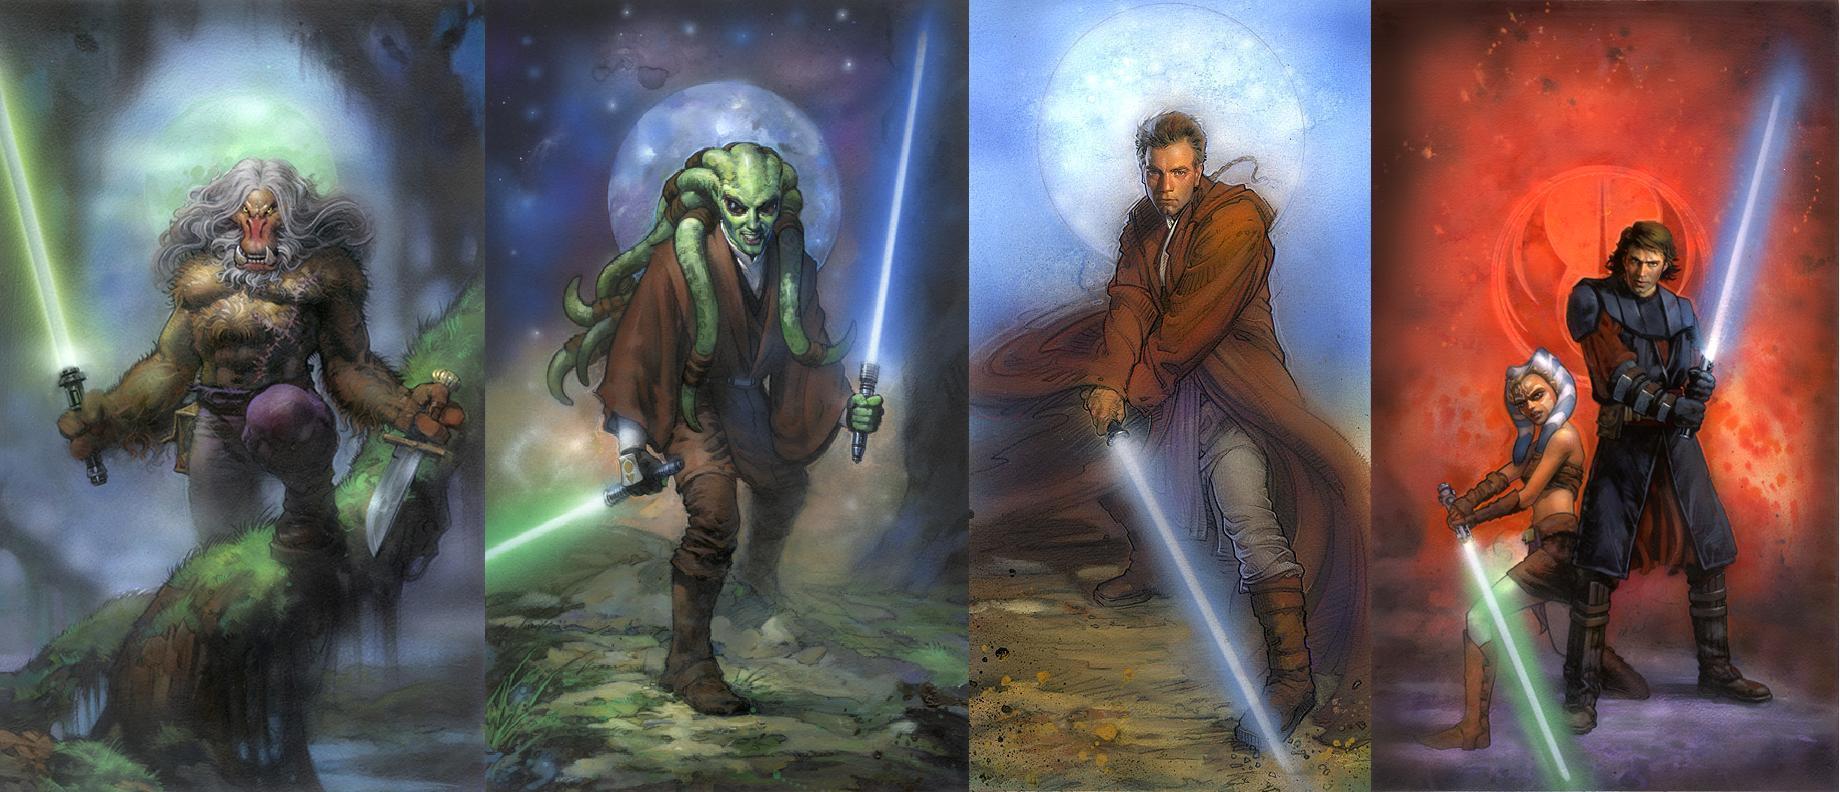 Star Wars Jedi Wallpapers Wallpaper Cave